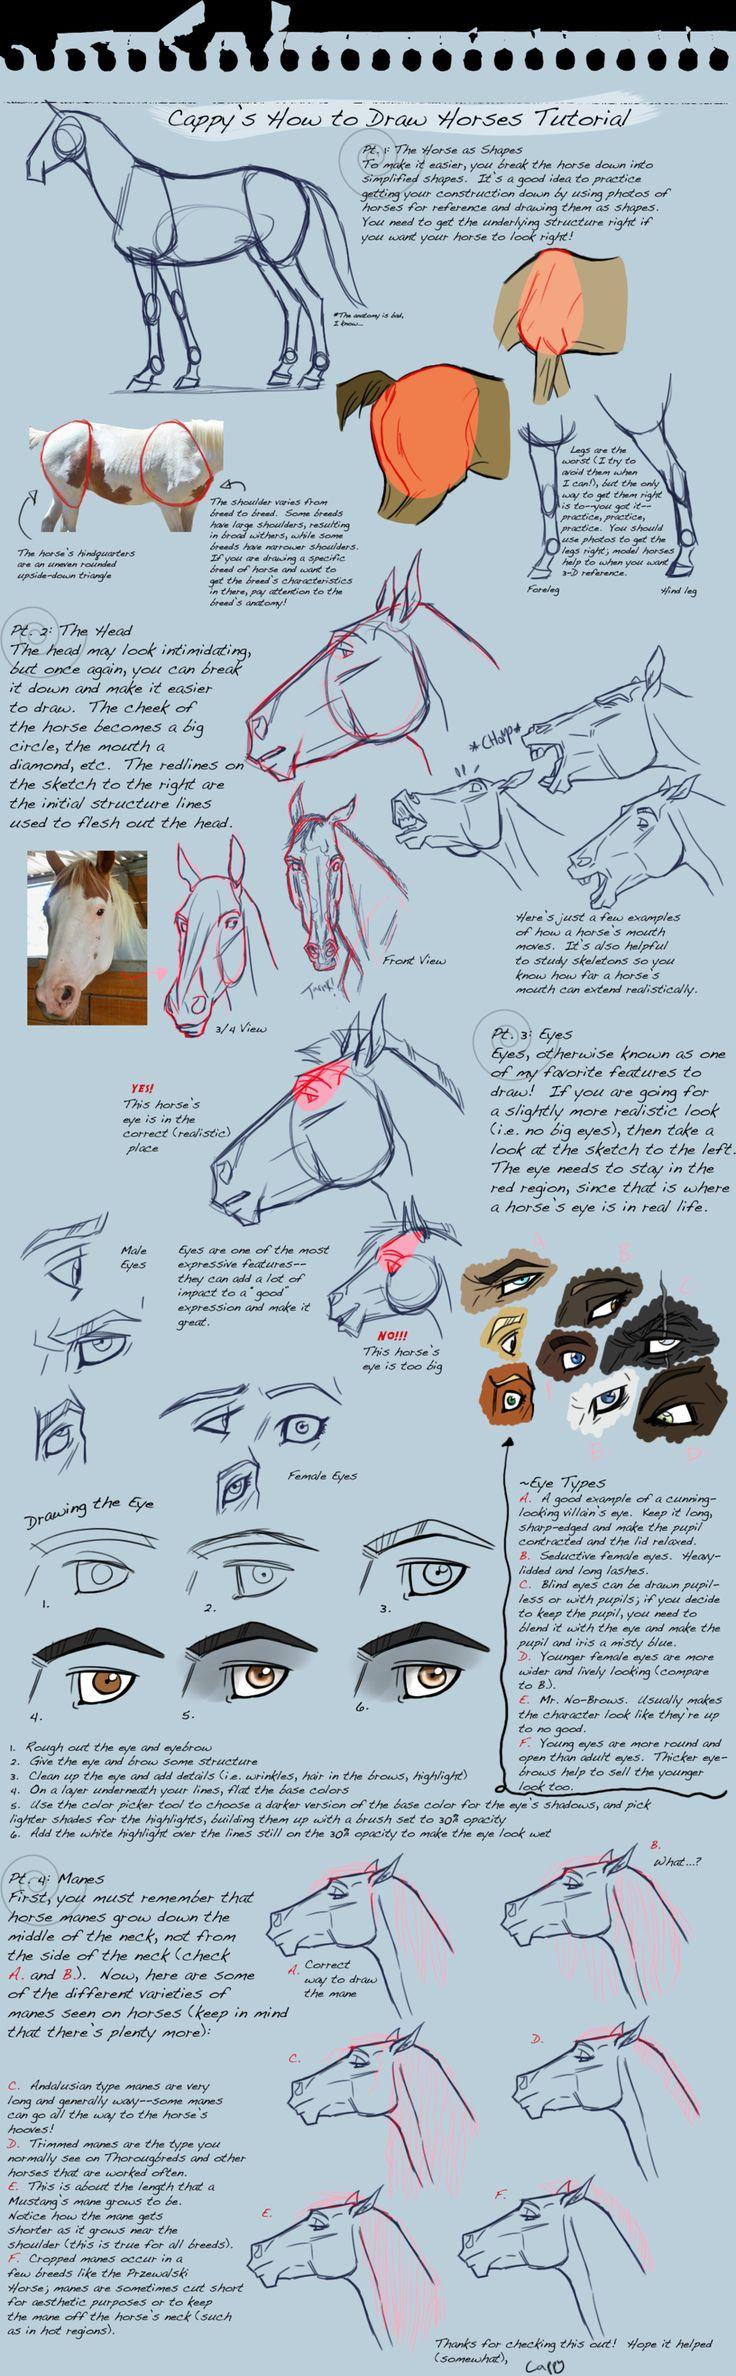 How To Draw Horses Tutorial by Capella336.deviantart.com on @deviantART